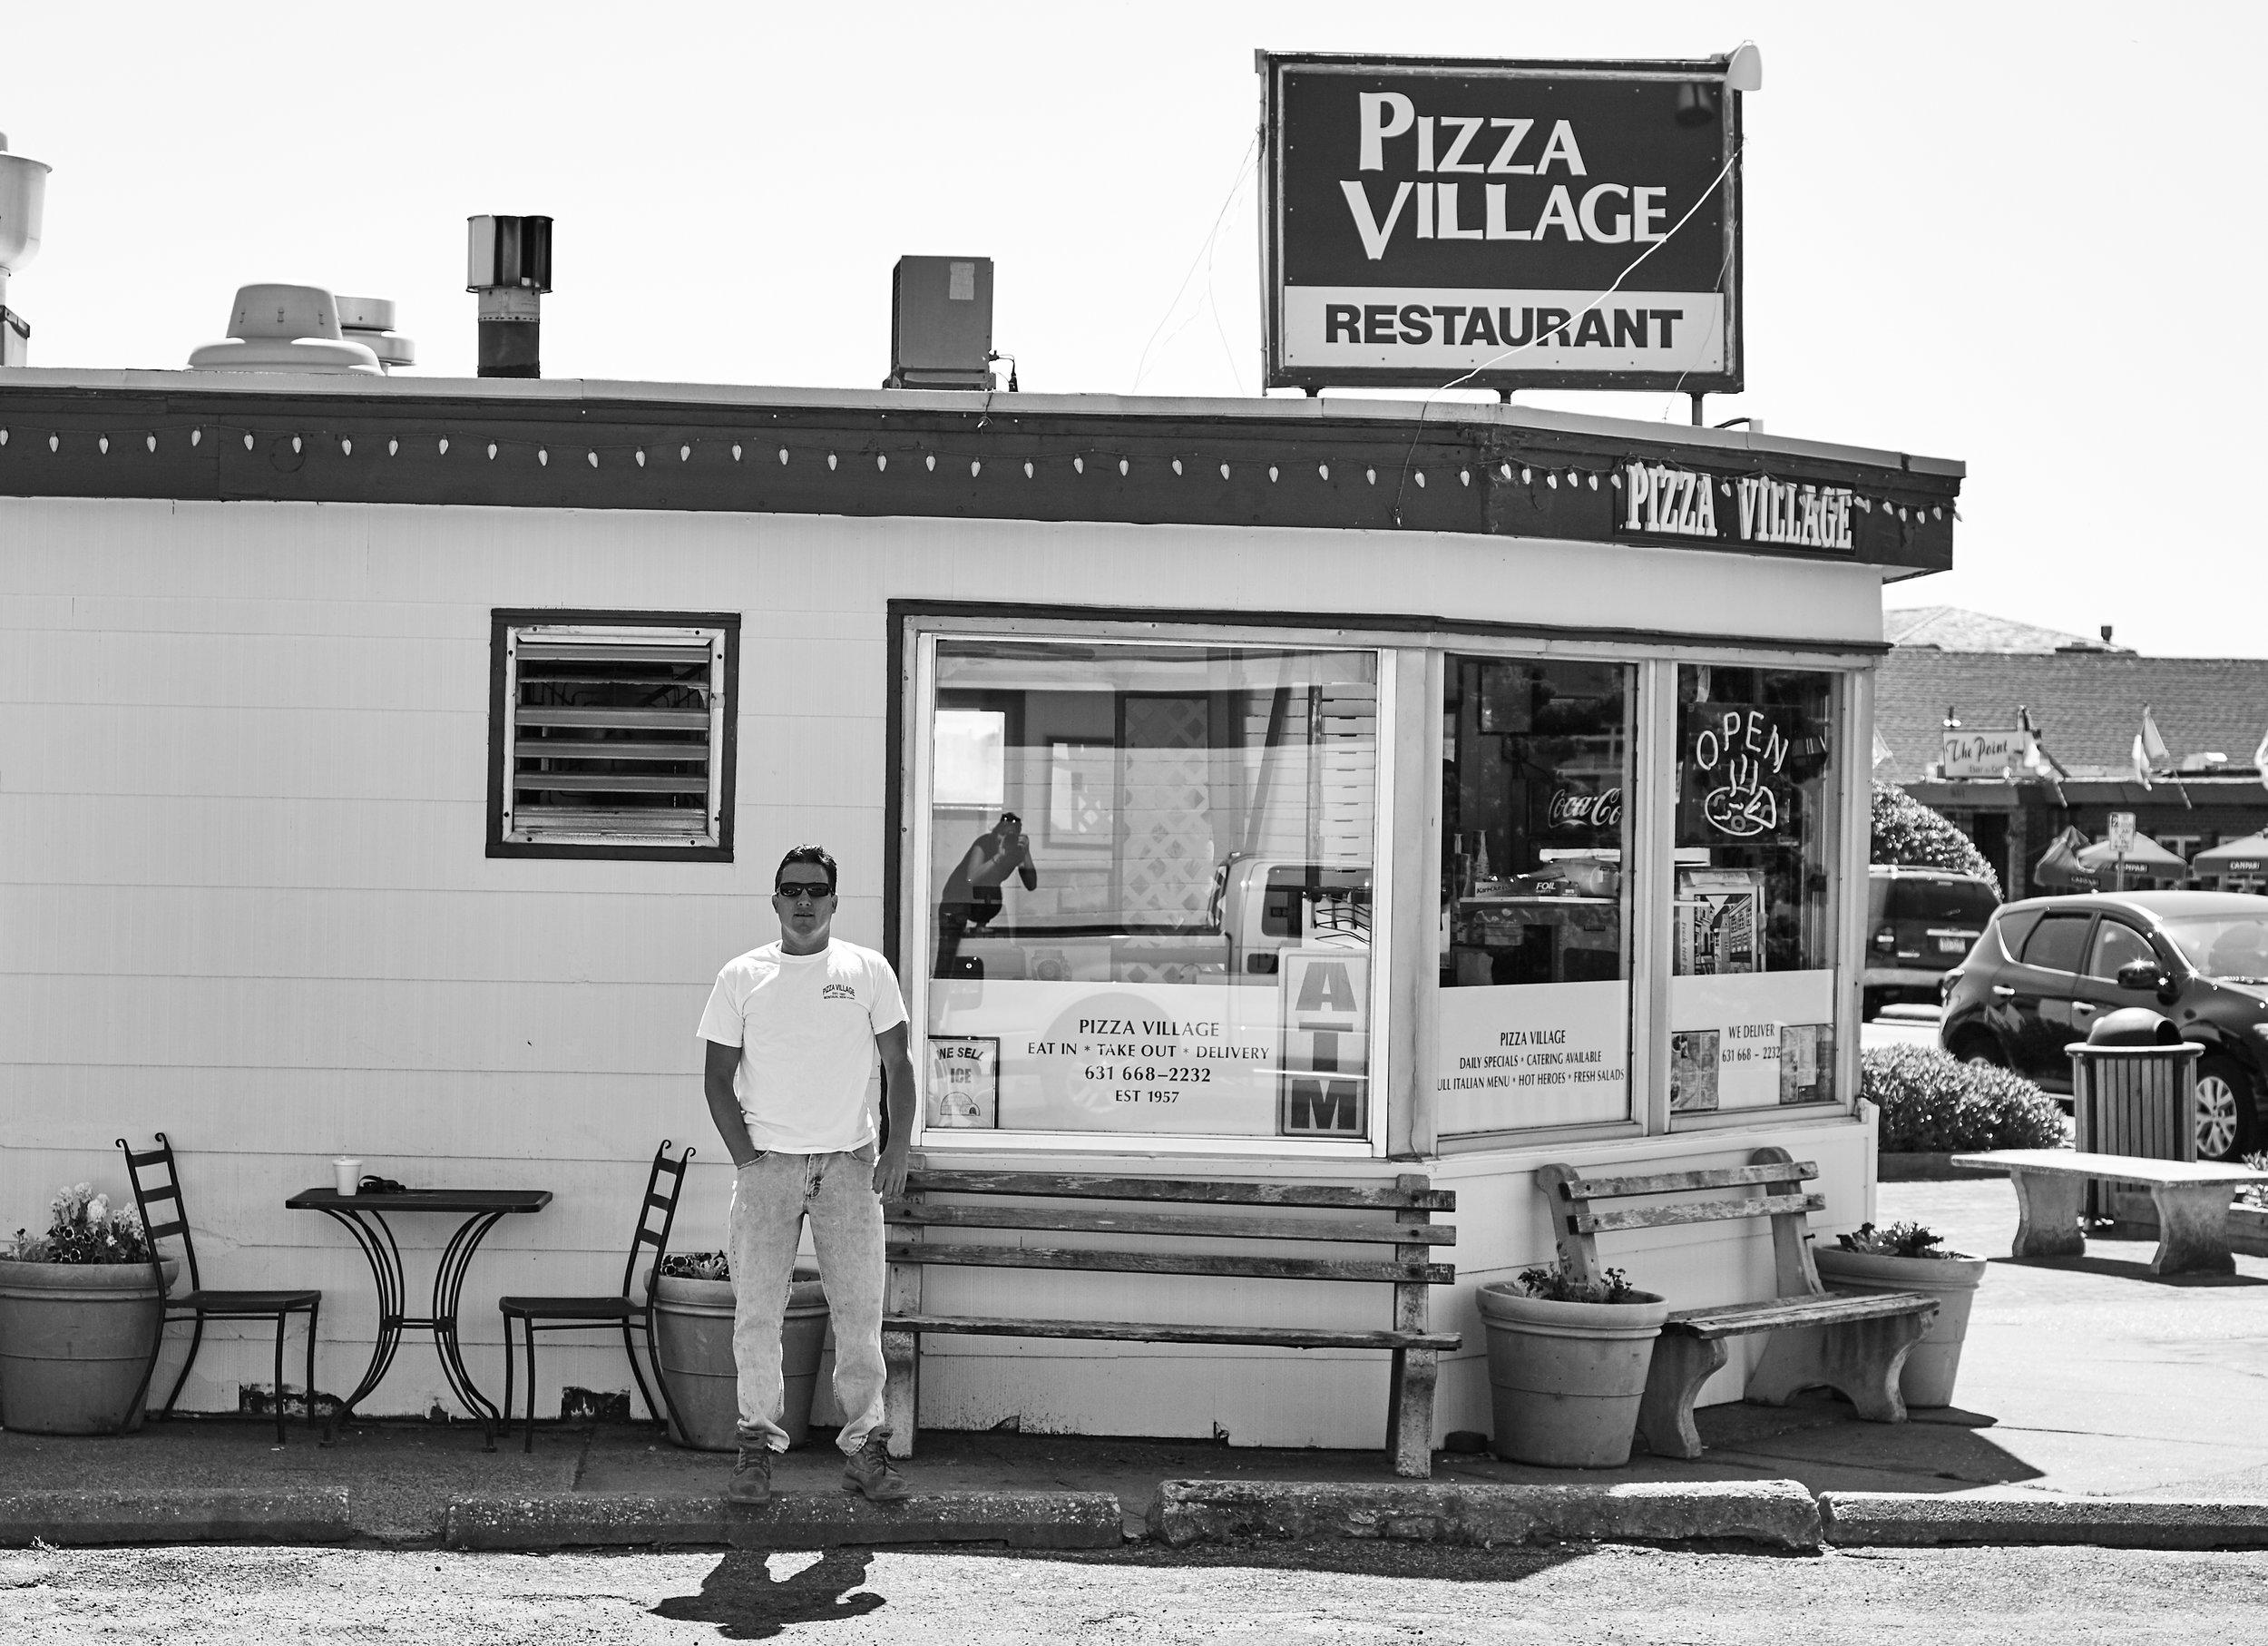 PizzaVillage_Montauk_07.jpg